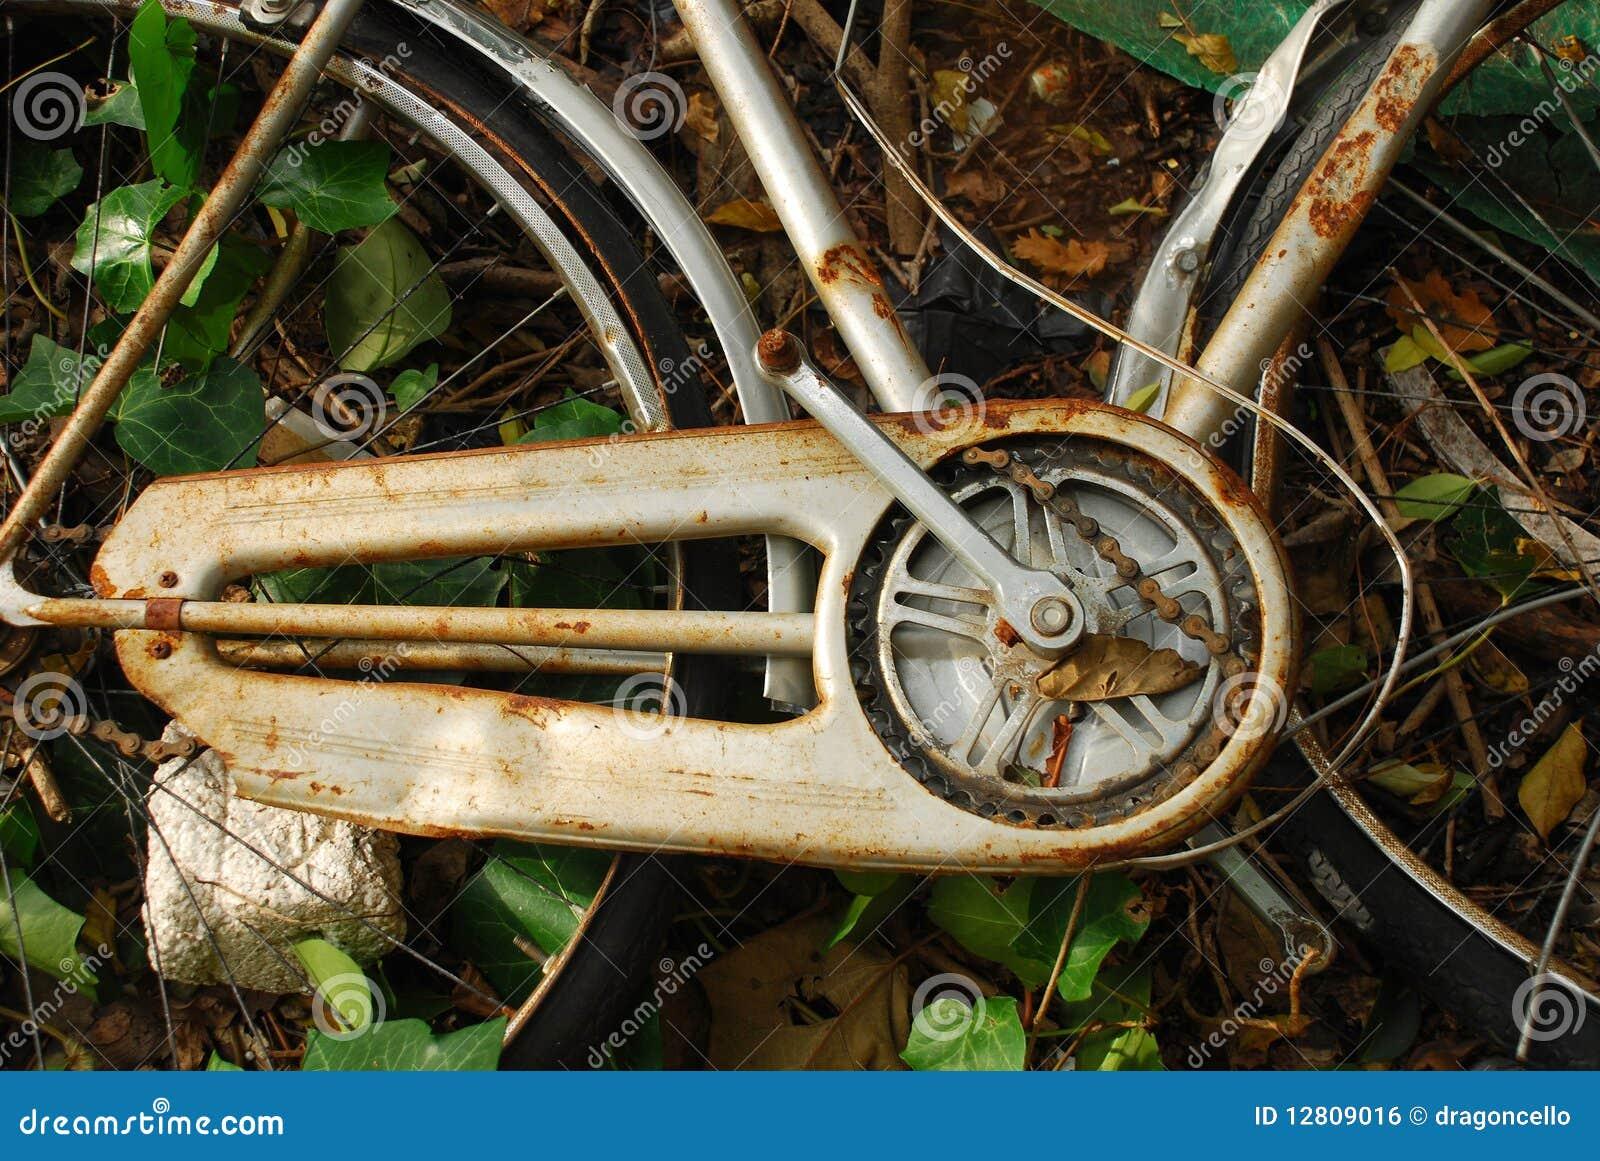 Bicicleta abandonada velha